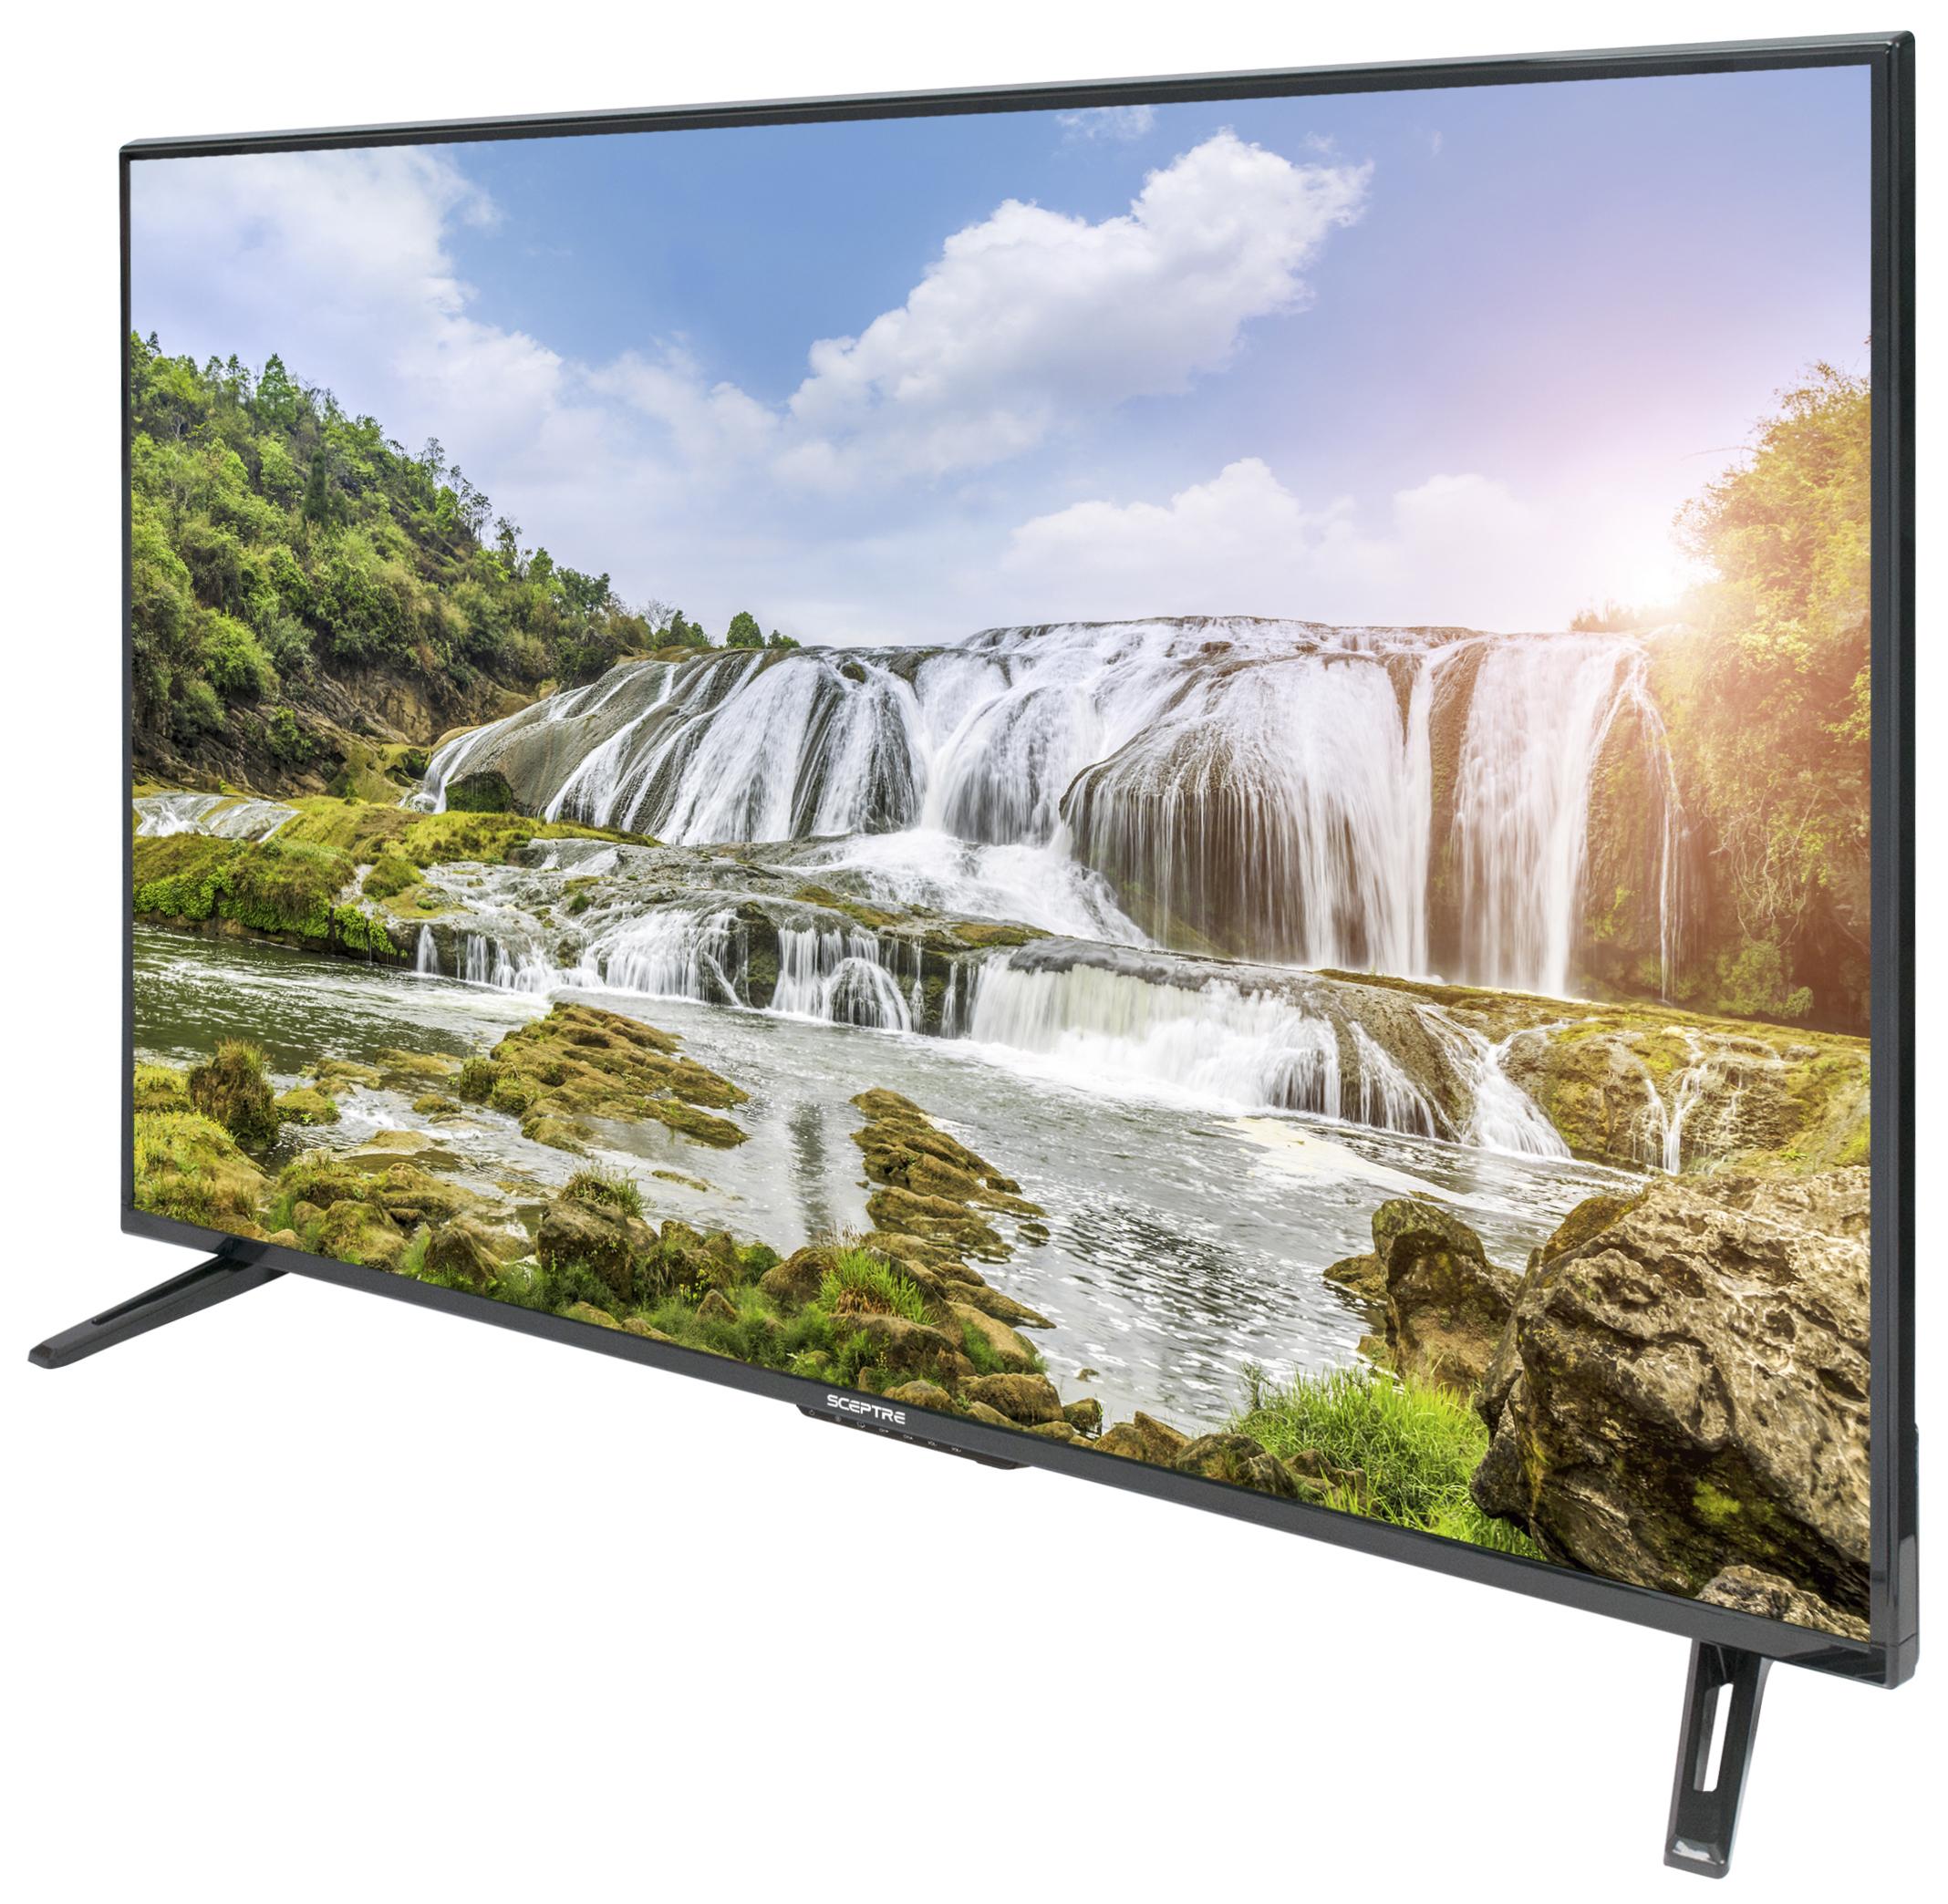 "Sceptre 43"" Class FHD (1080P) LED TV (X435BV-F) - $139.99"